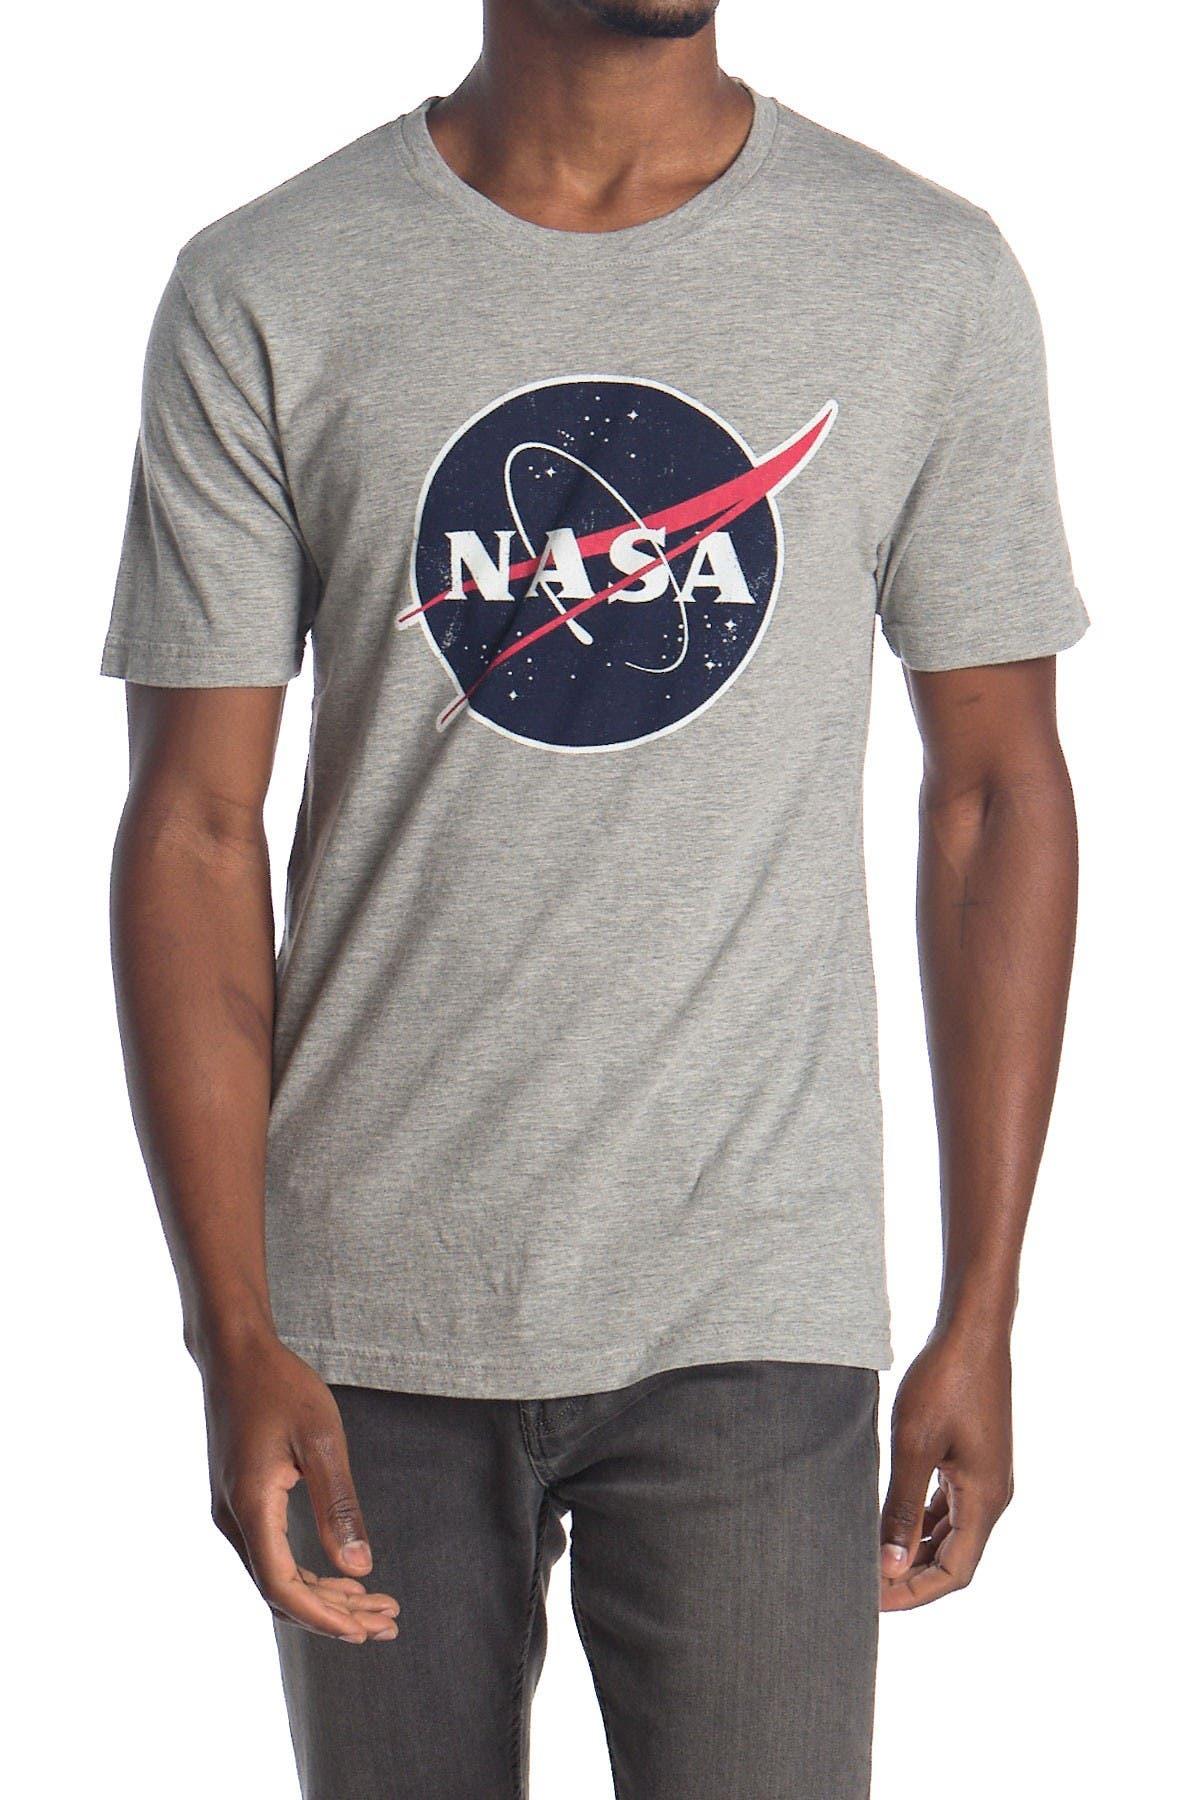 Image of American Needle Brass Tack NASA Short Sleeve T-Shirt